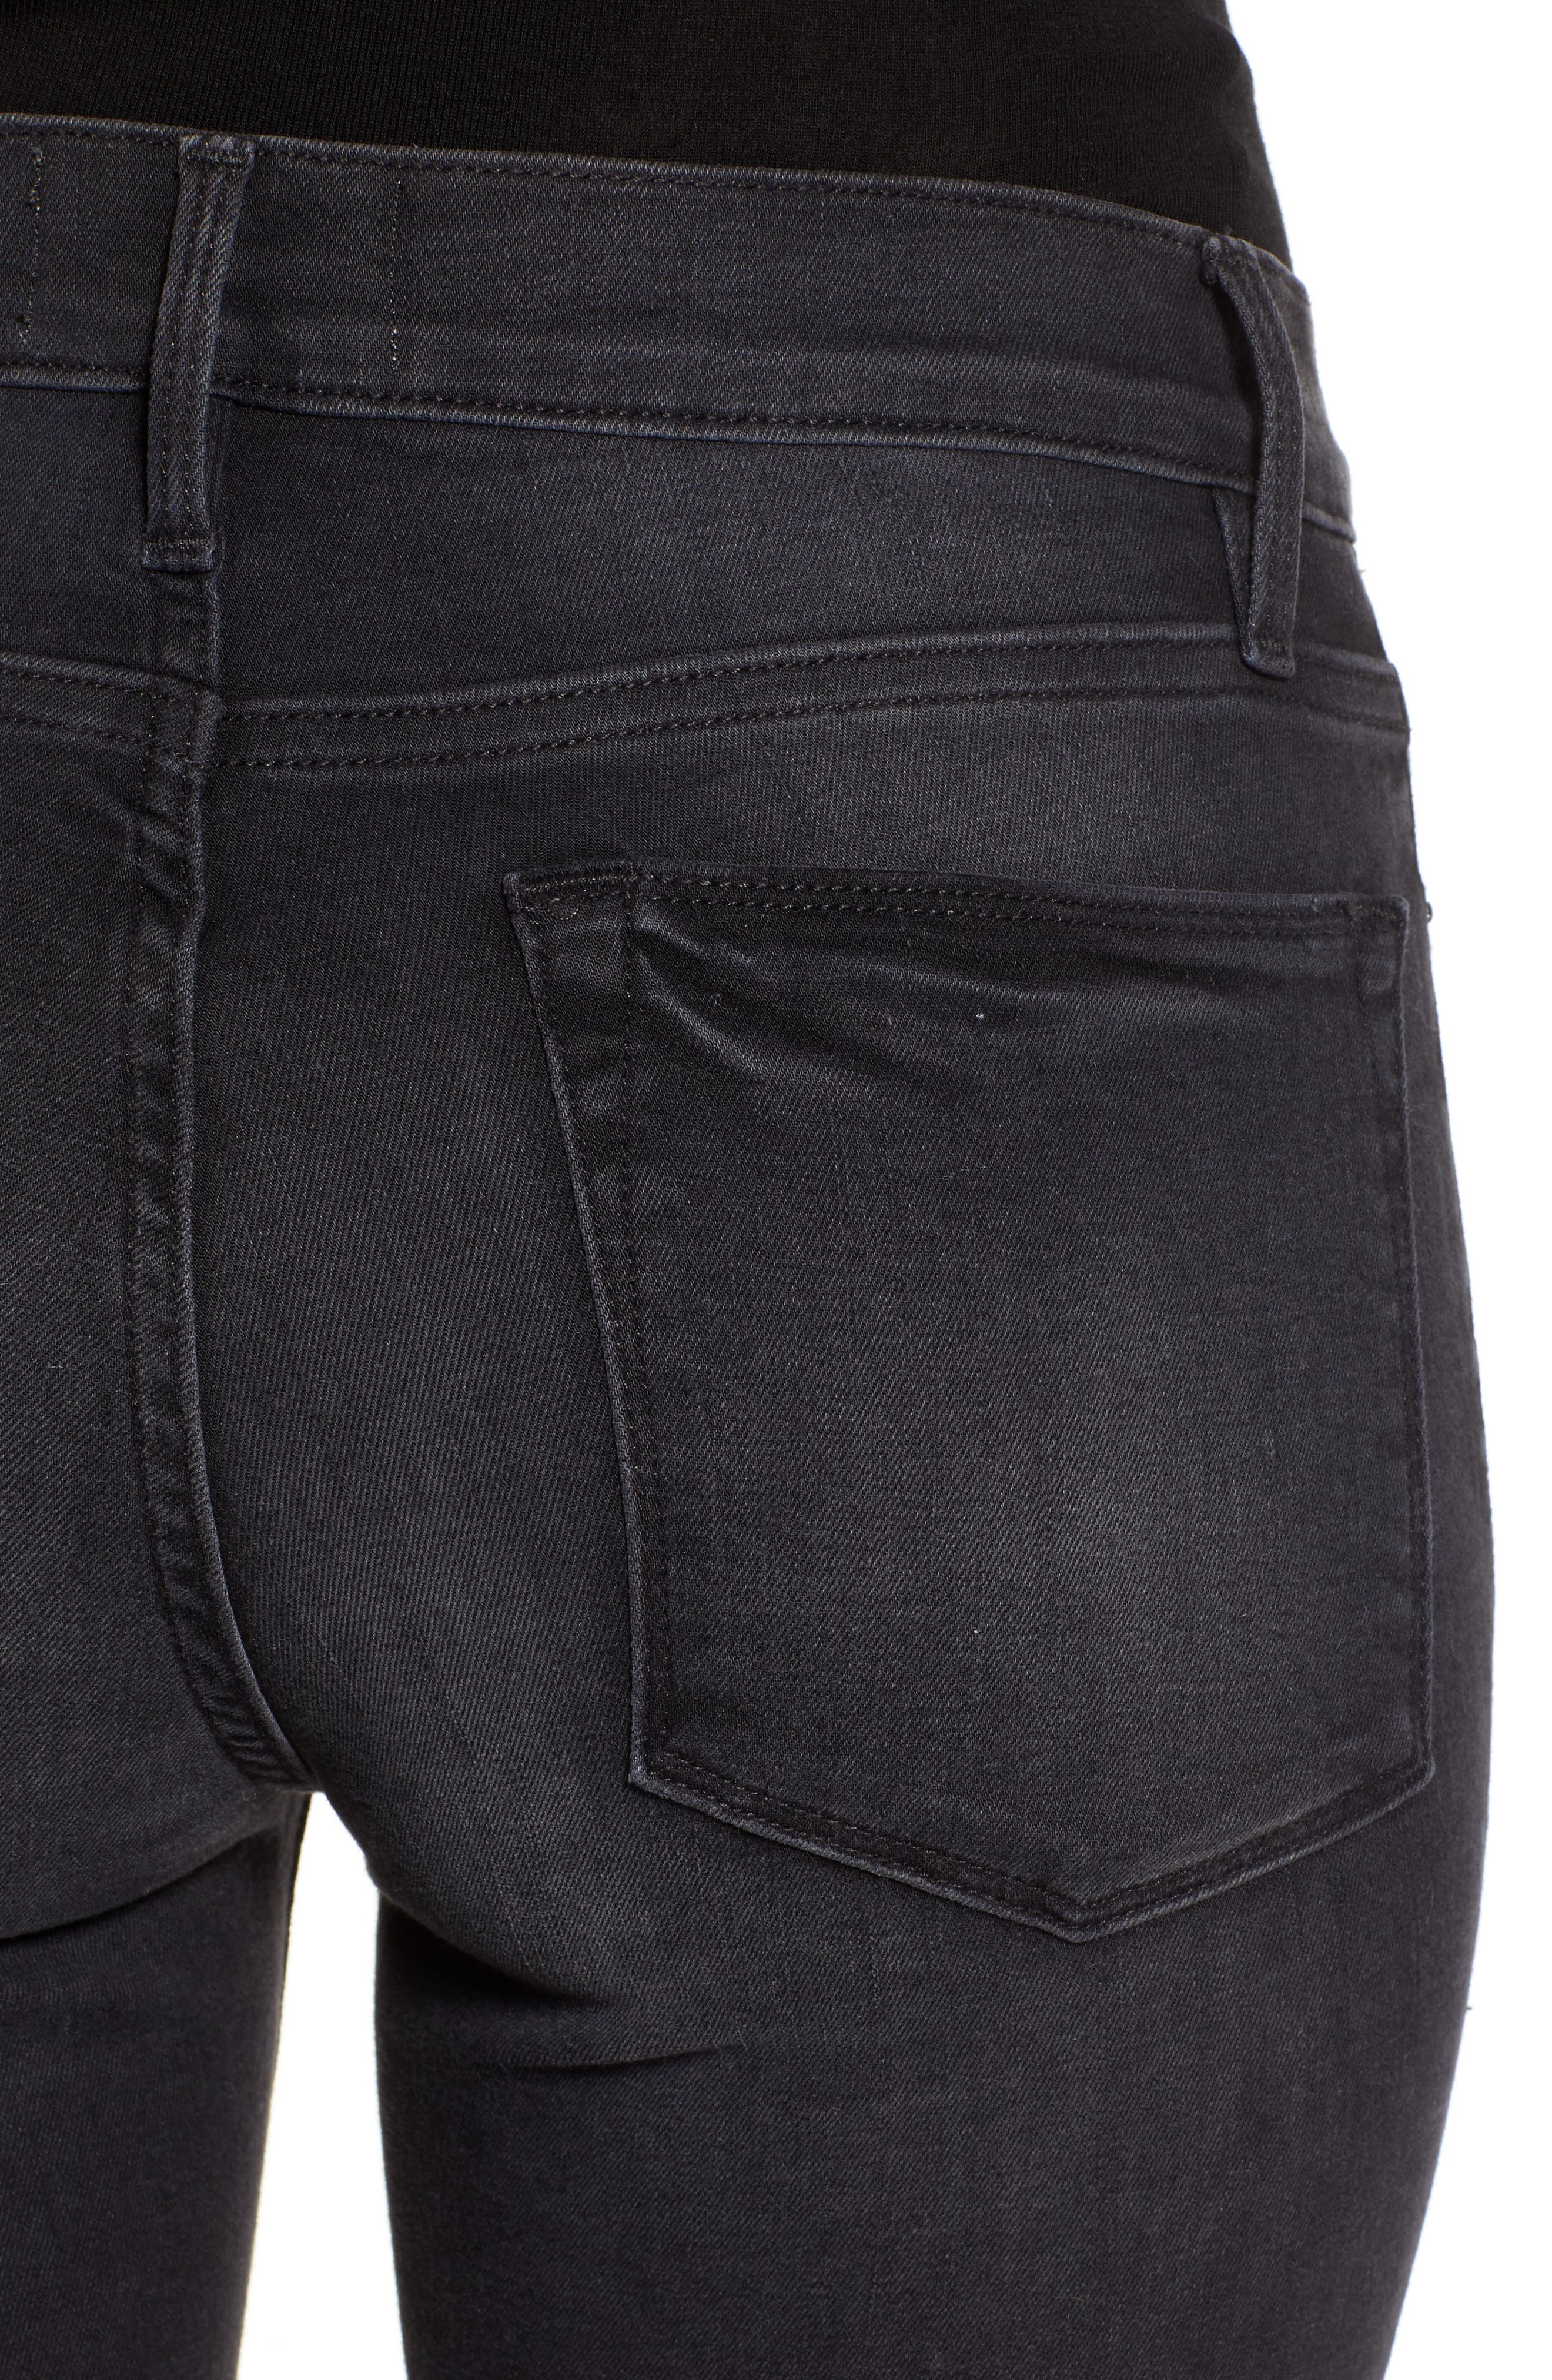 Le High Skinny Jeans,                             Alternate thumbnail 4, color,                             NIGHTFALL